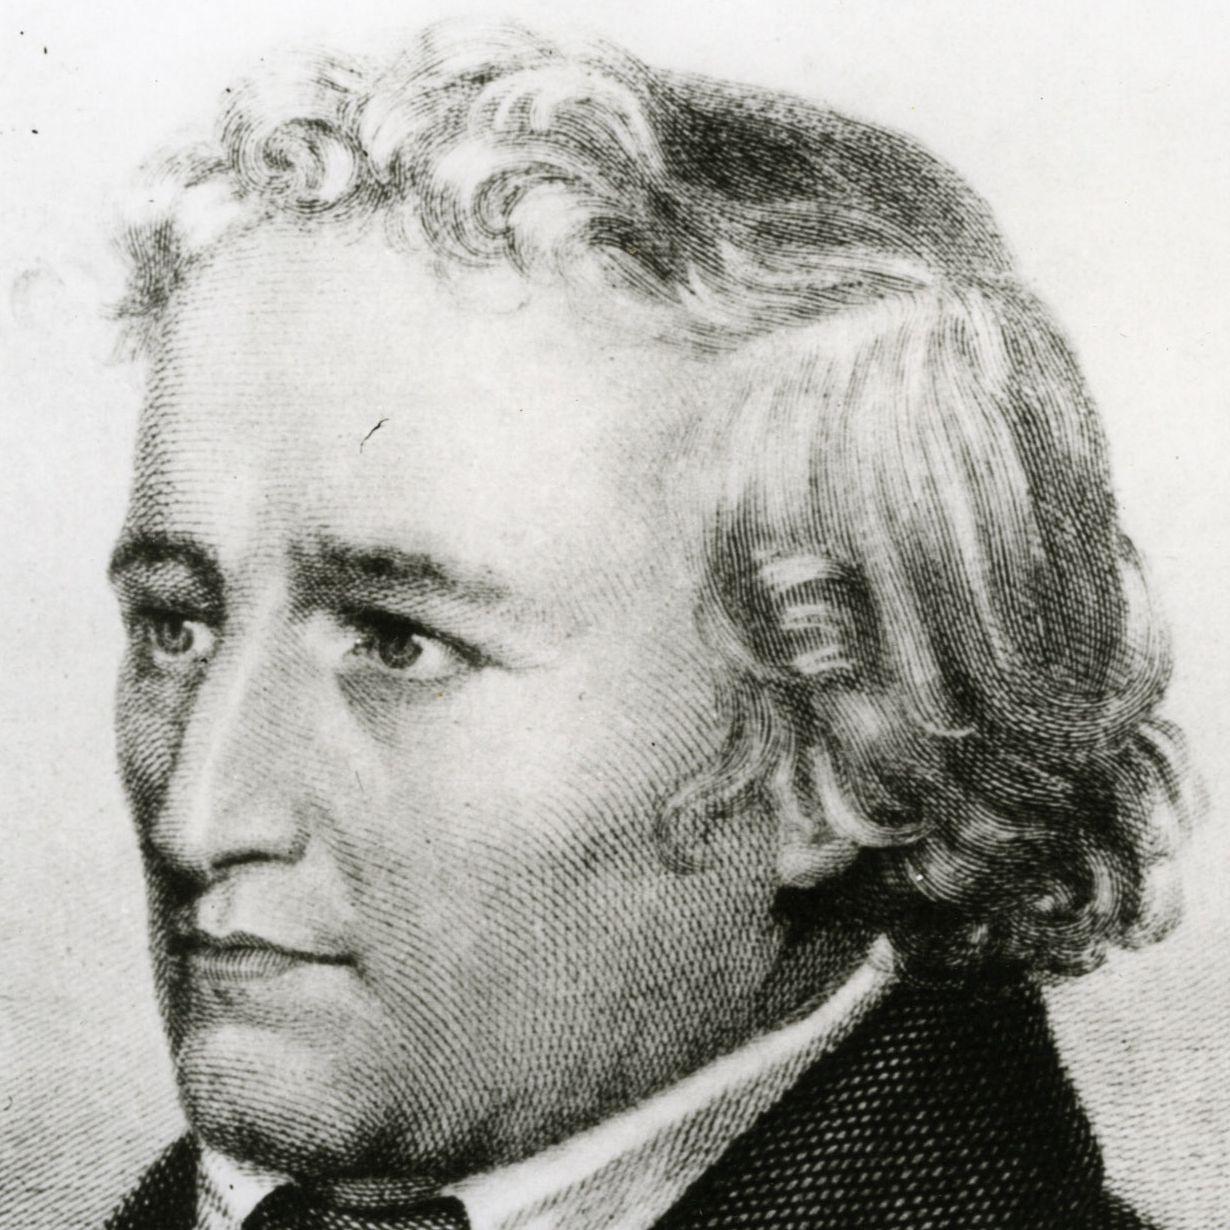 lemo biografie biografie jacob grimm - Bruder Grimm Lebenslauf